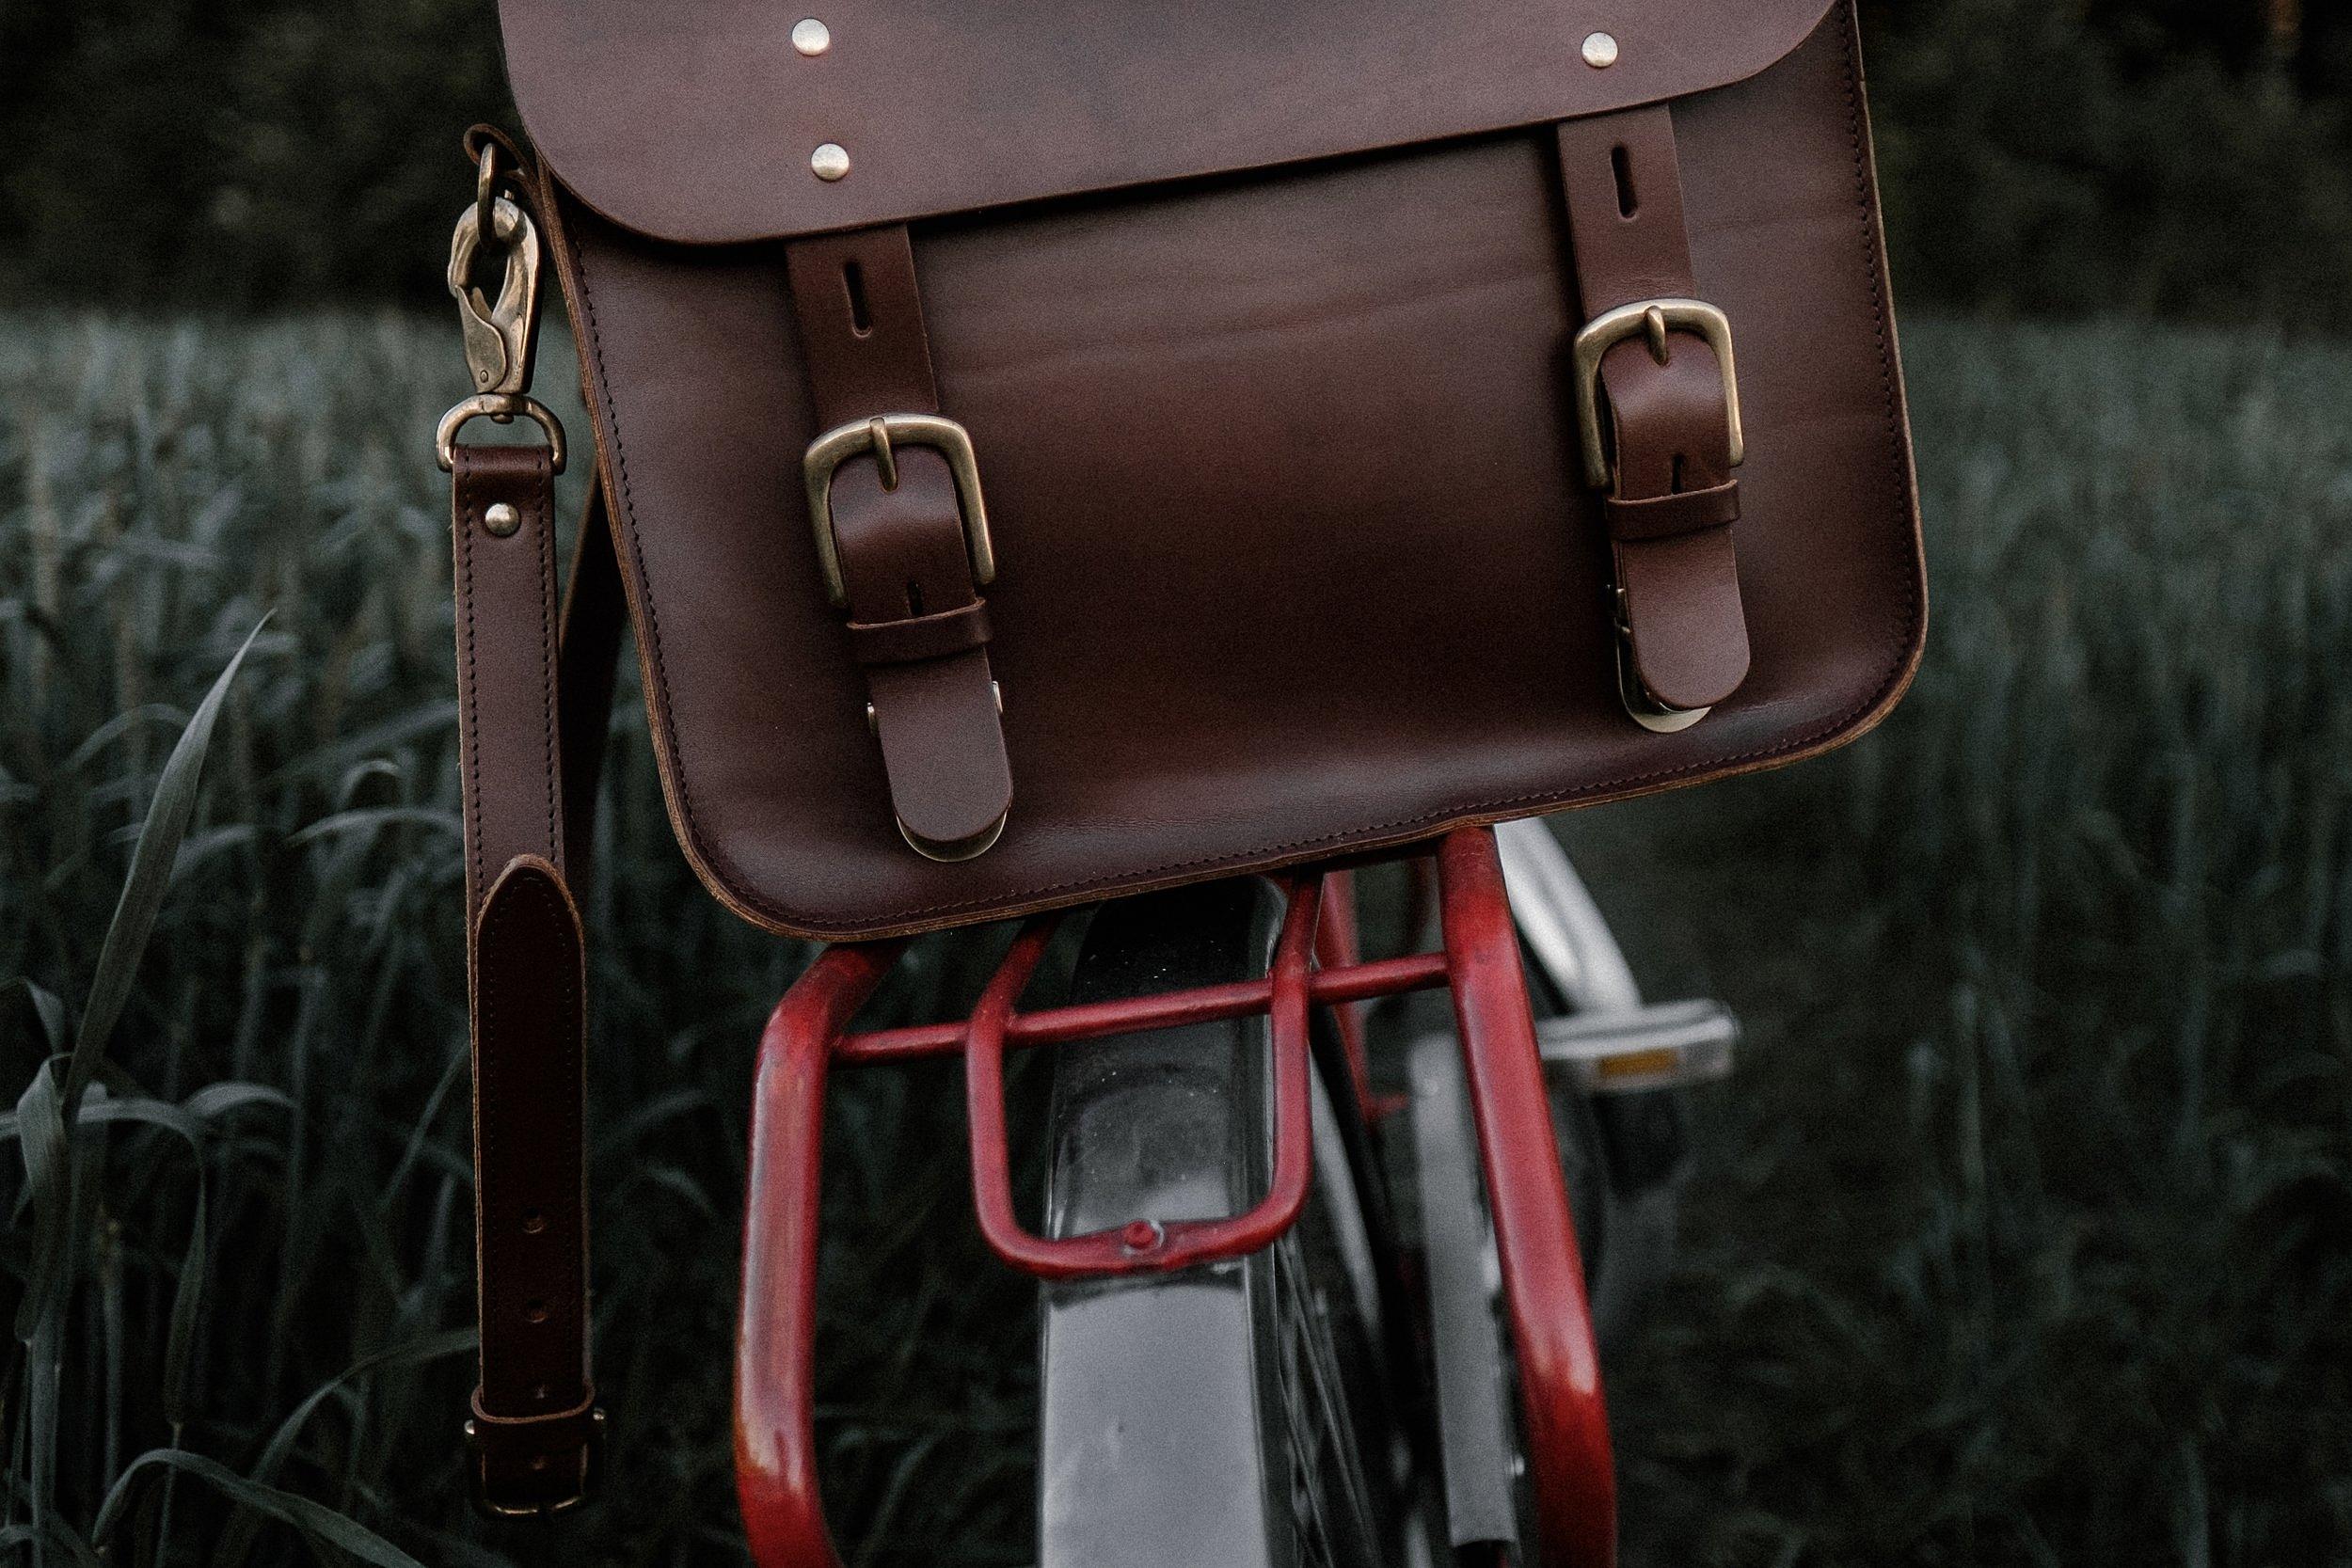 fig-bags-rucksack-magazine-5.jpg